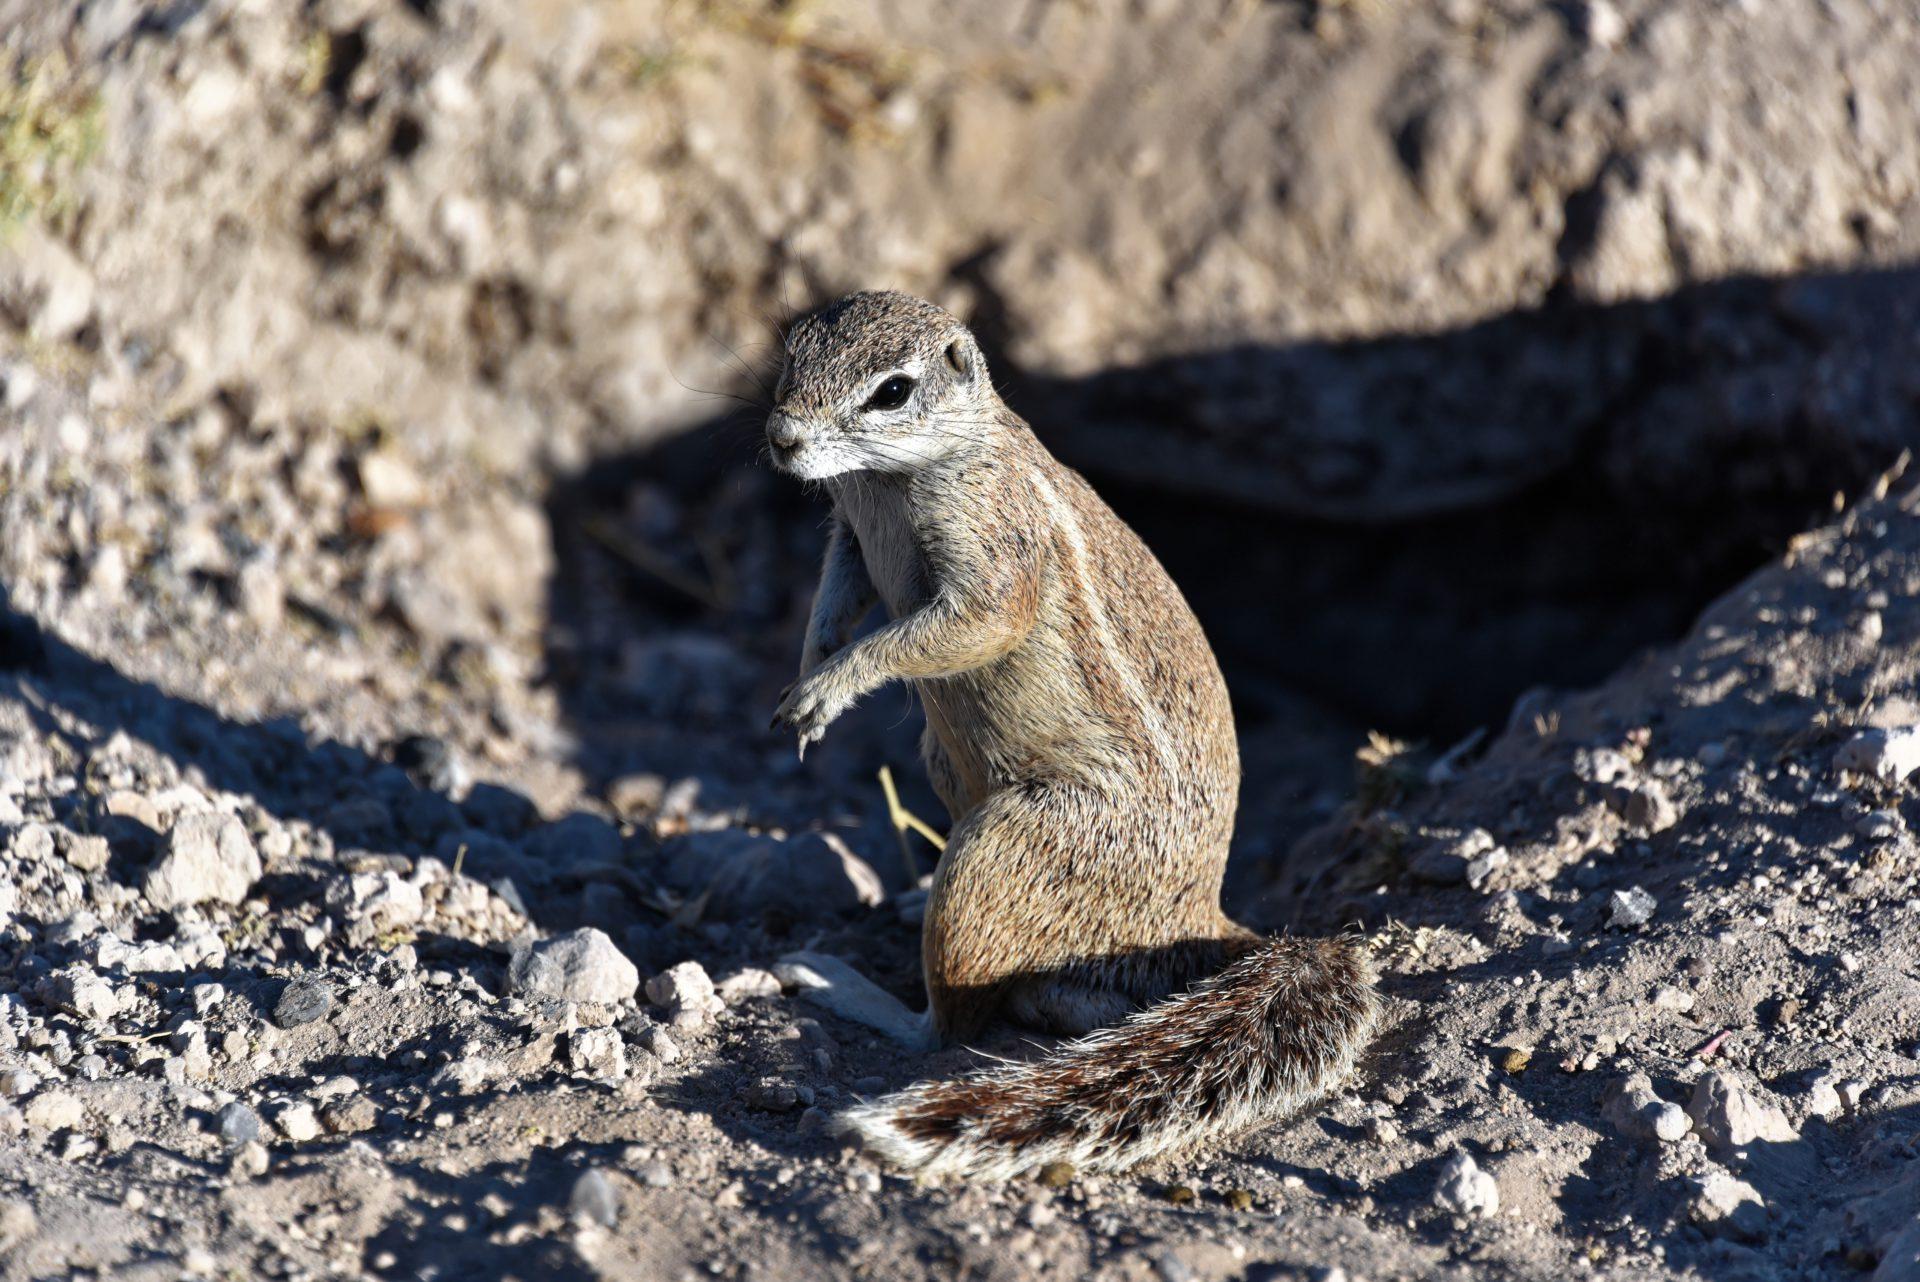 Kap-Borstenhörnchen - Etosha National Park - Namibia